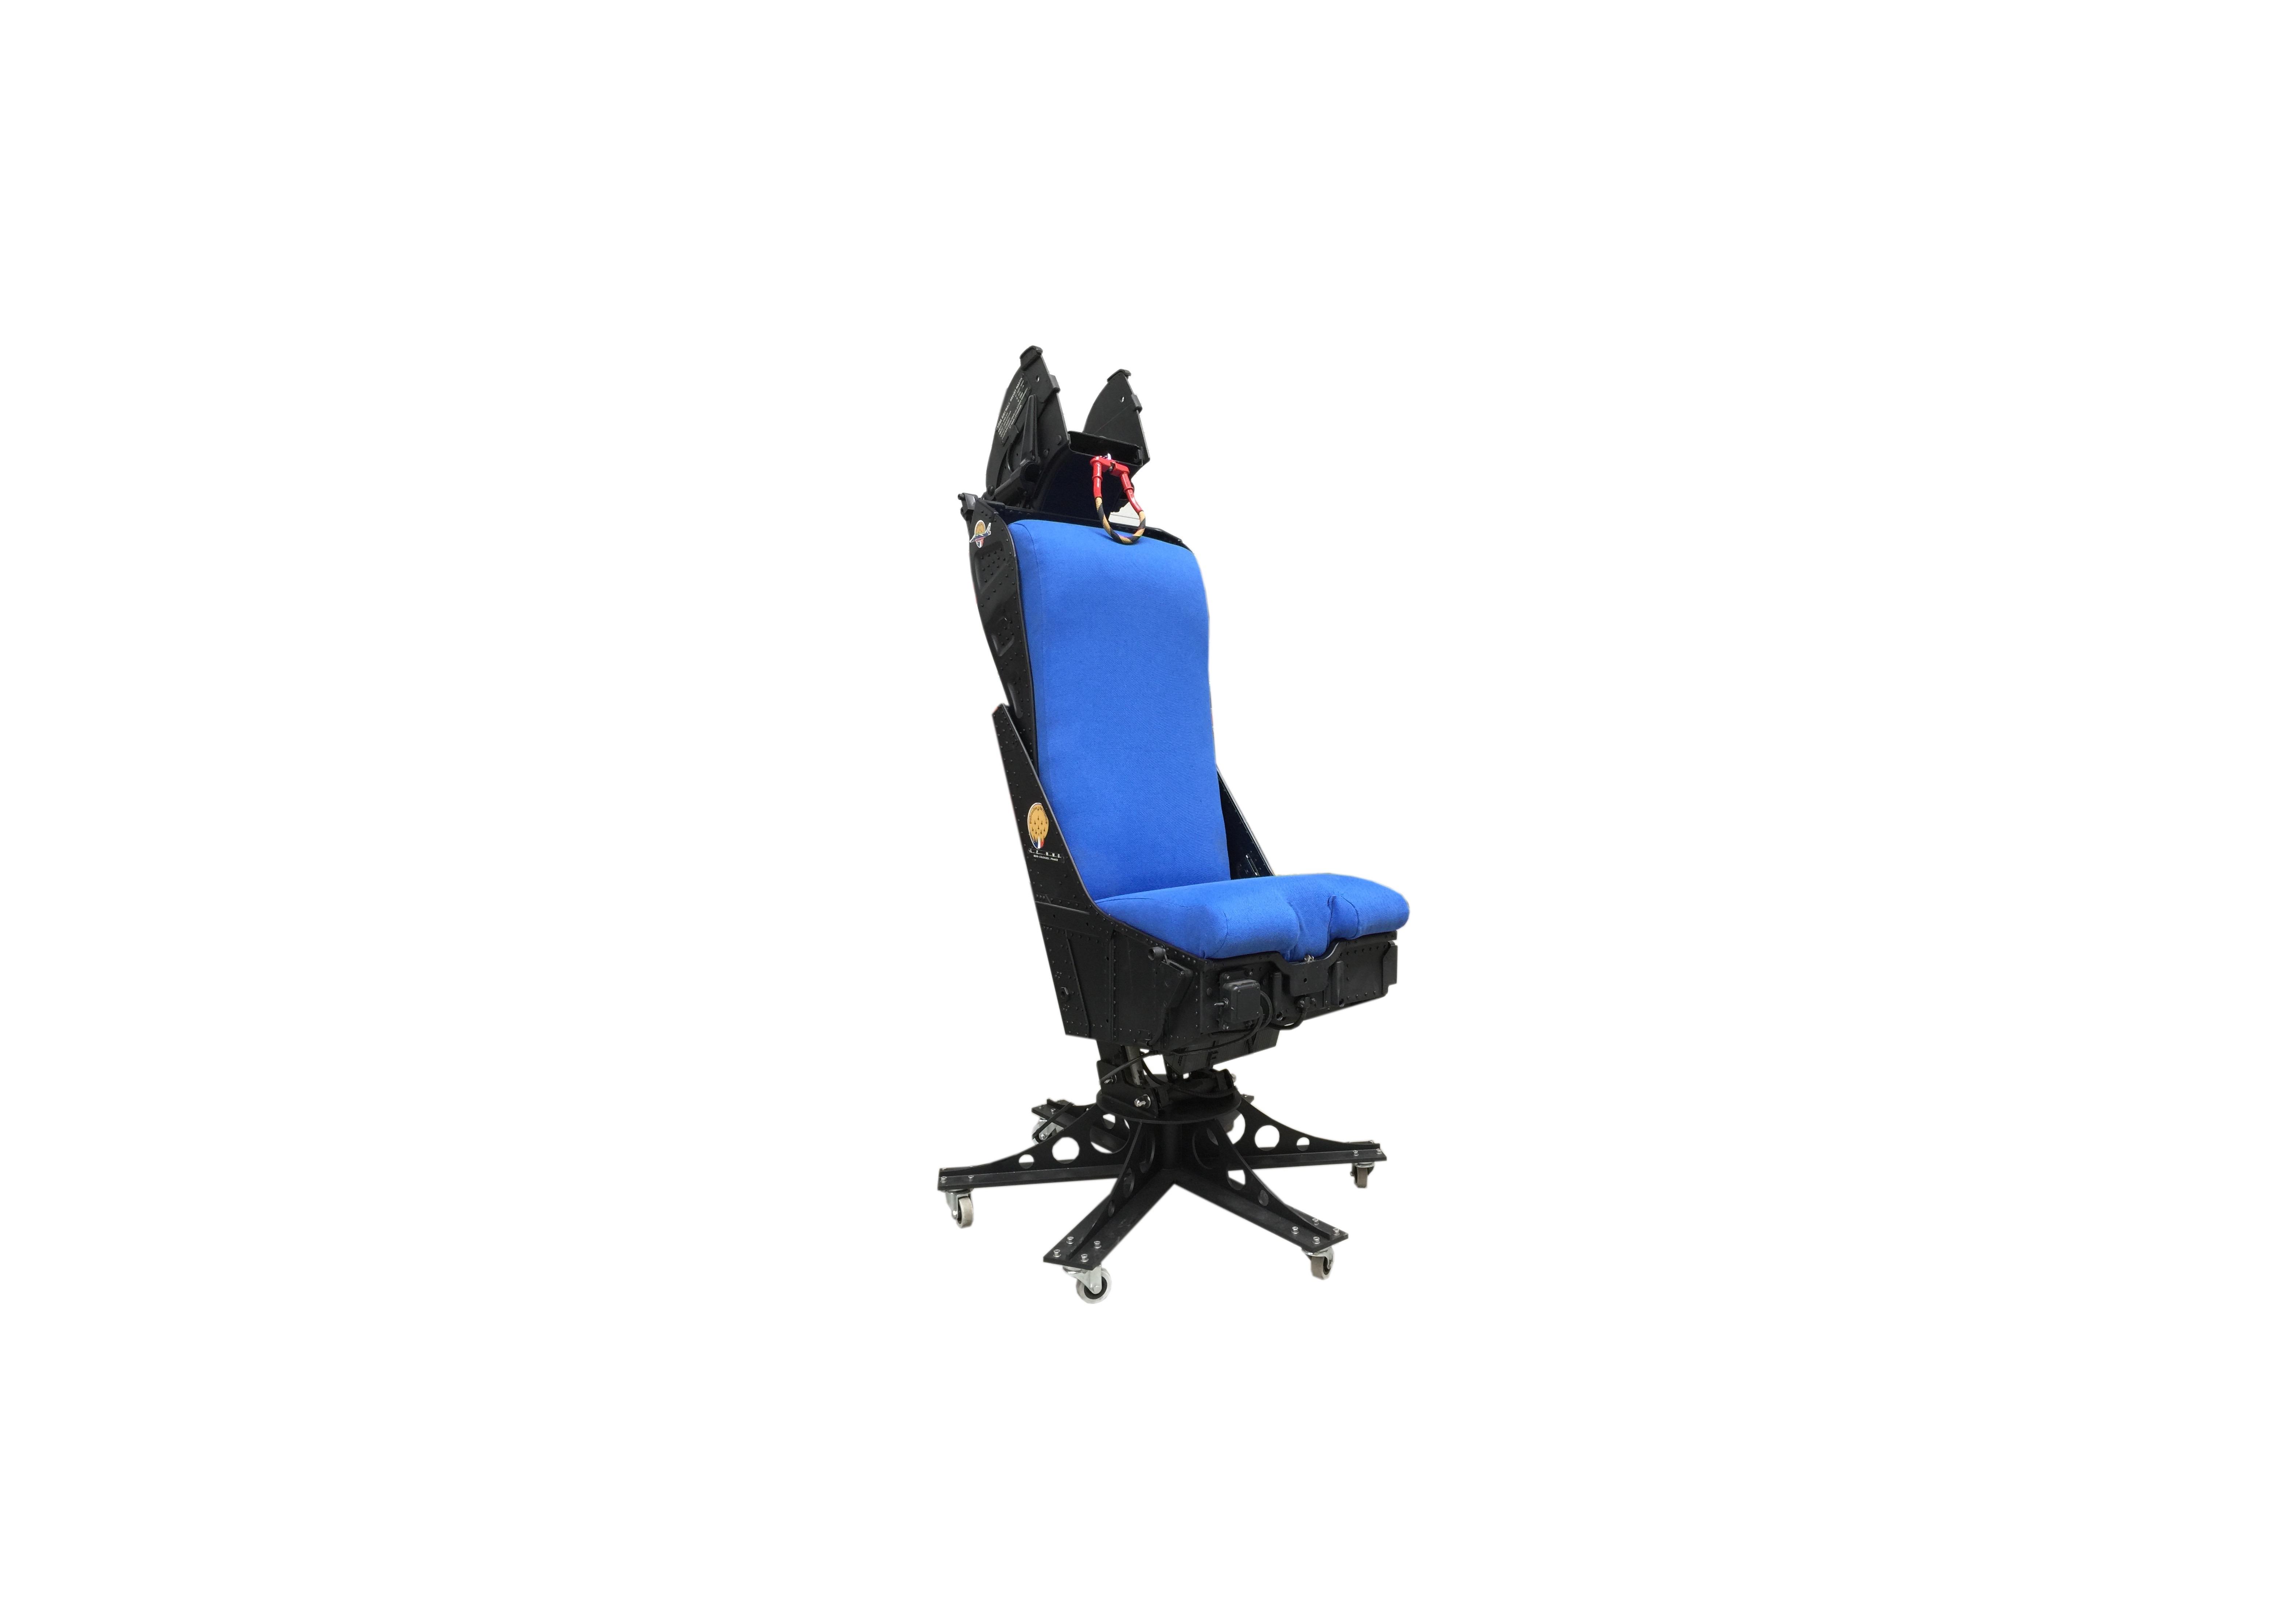 AlphaJet seat